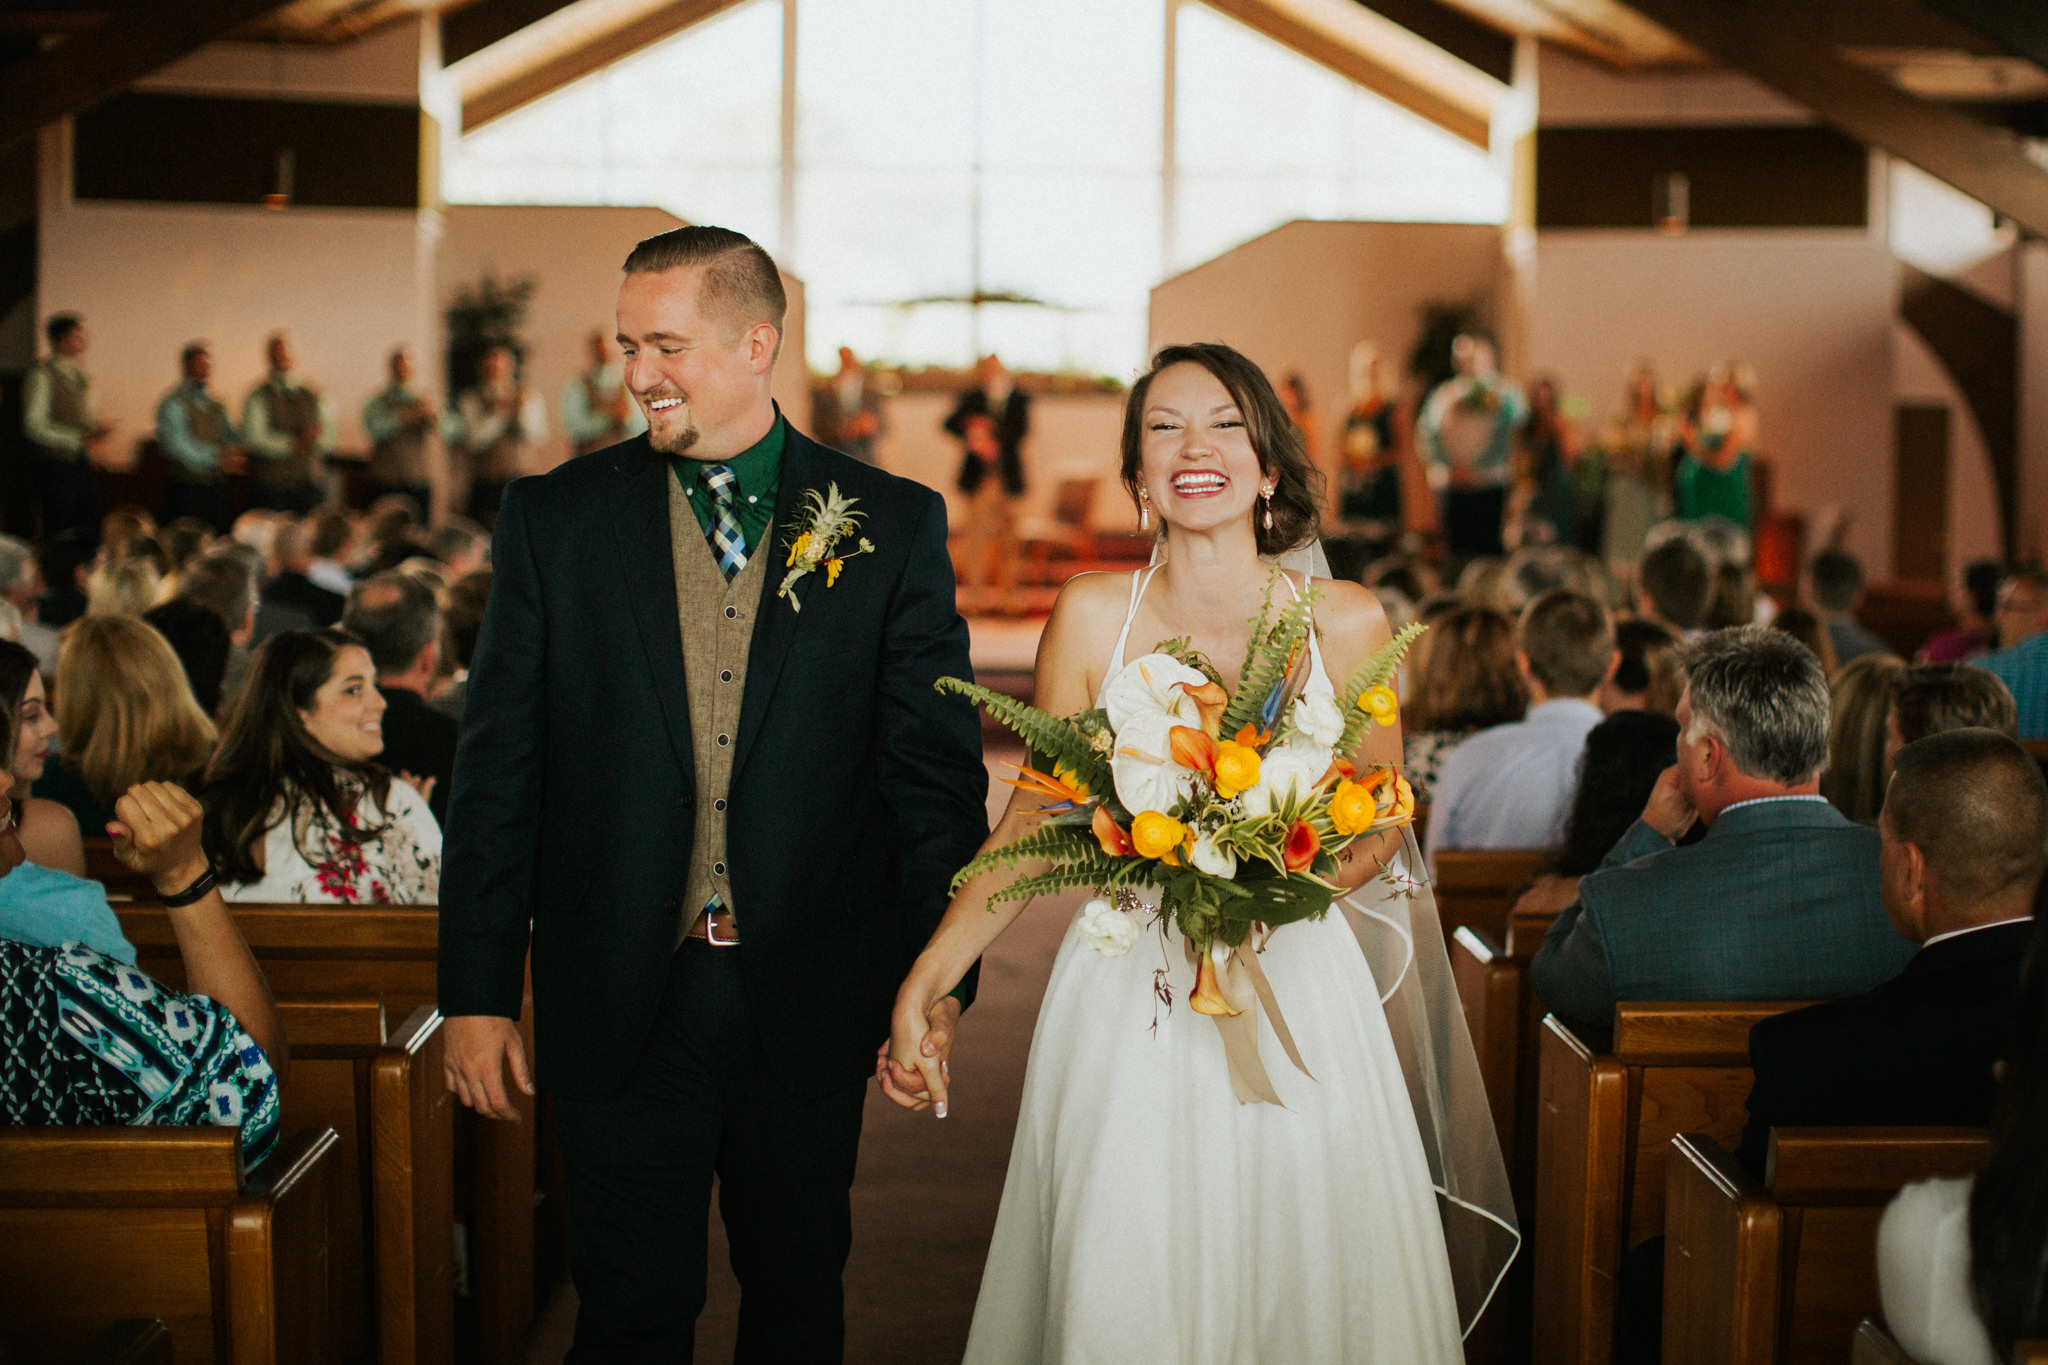 Virginia Wedding Photographer - Best - Pat Cori Photography